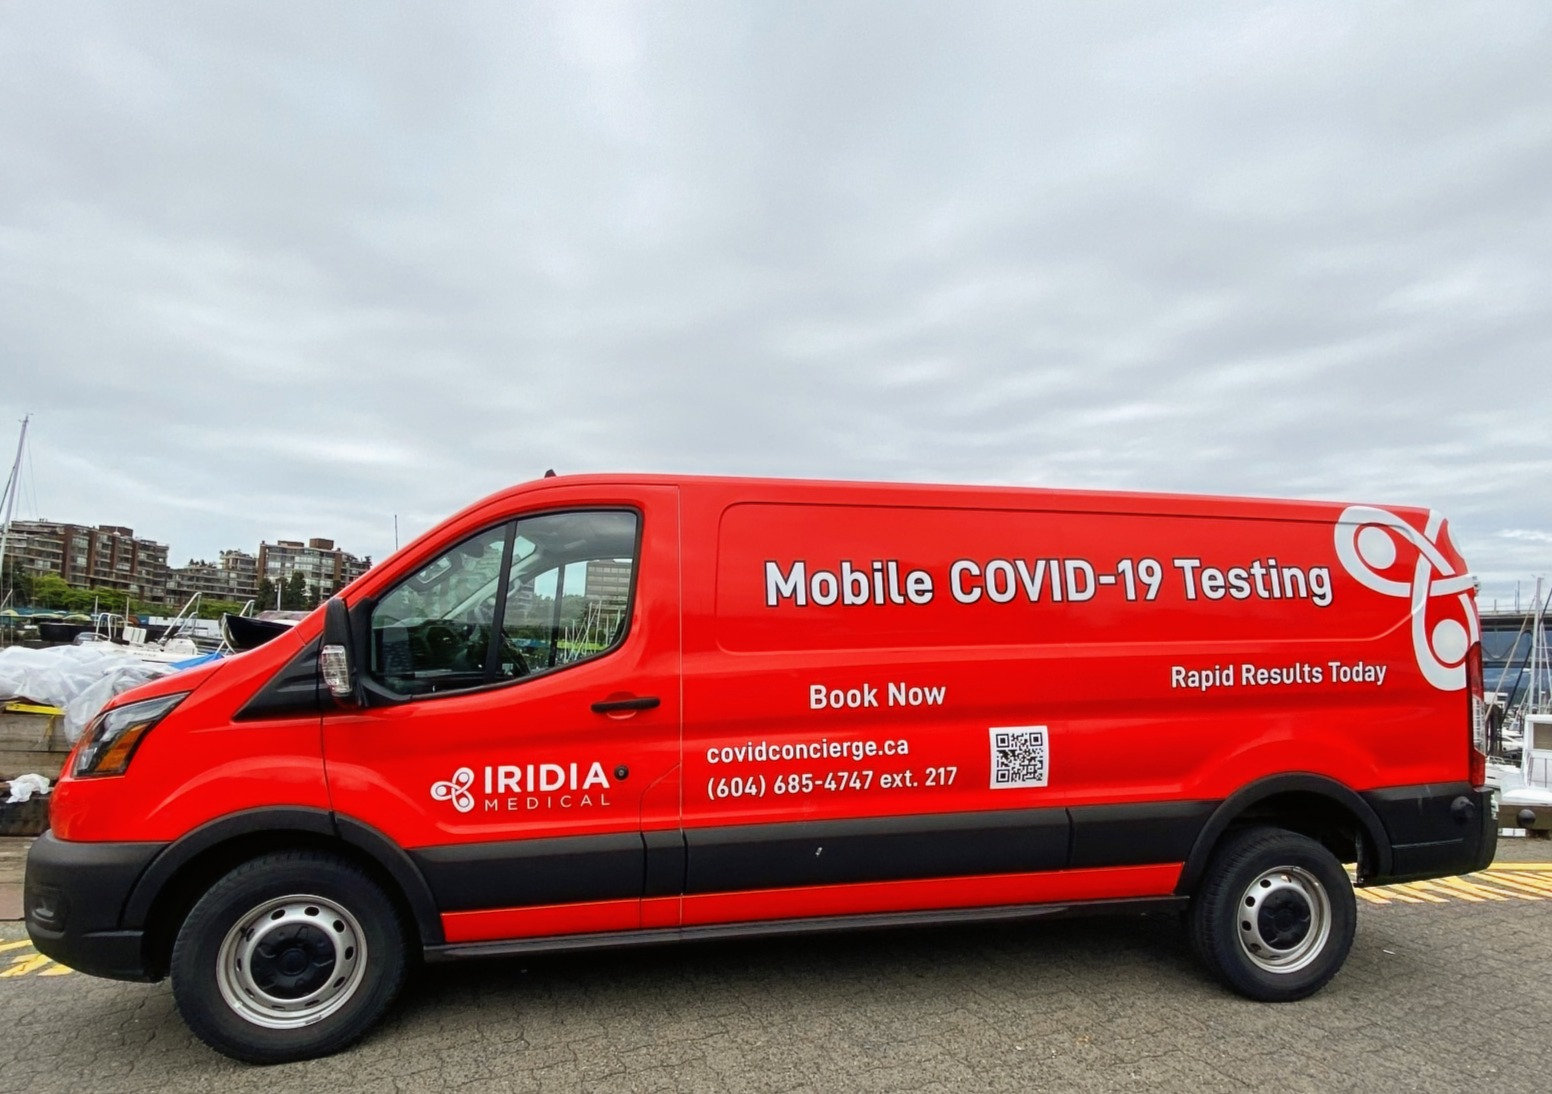 Mobile COVID-19 Testing